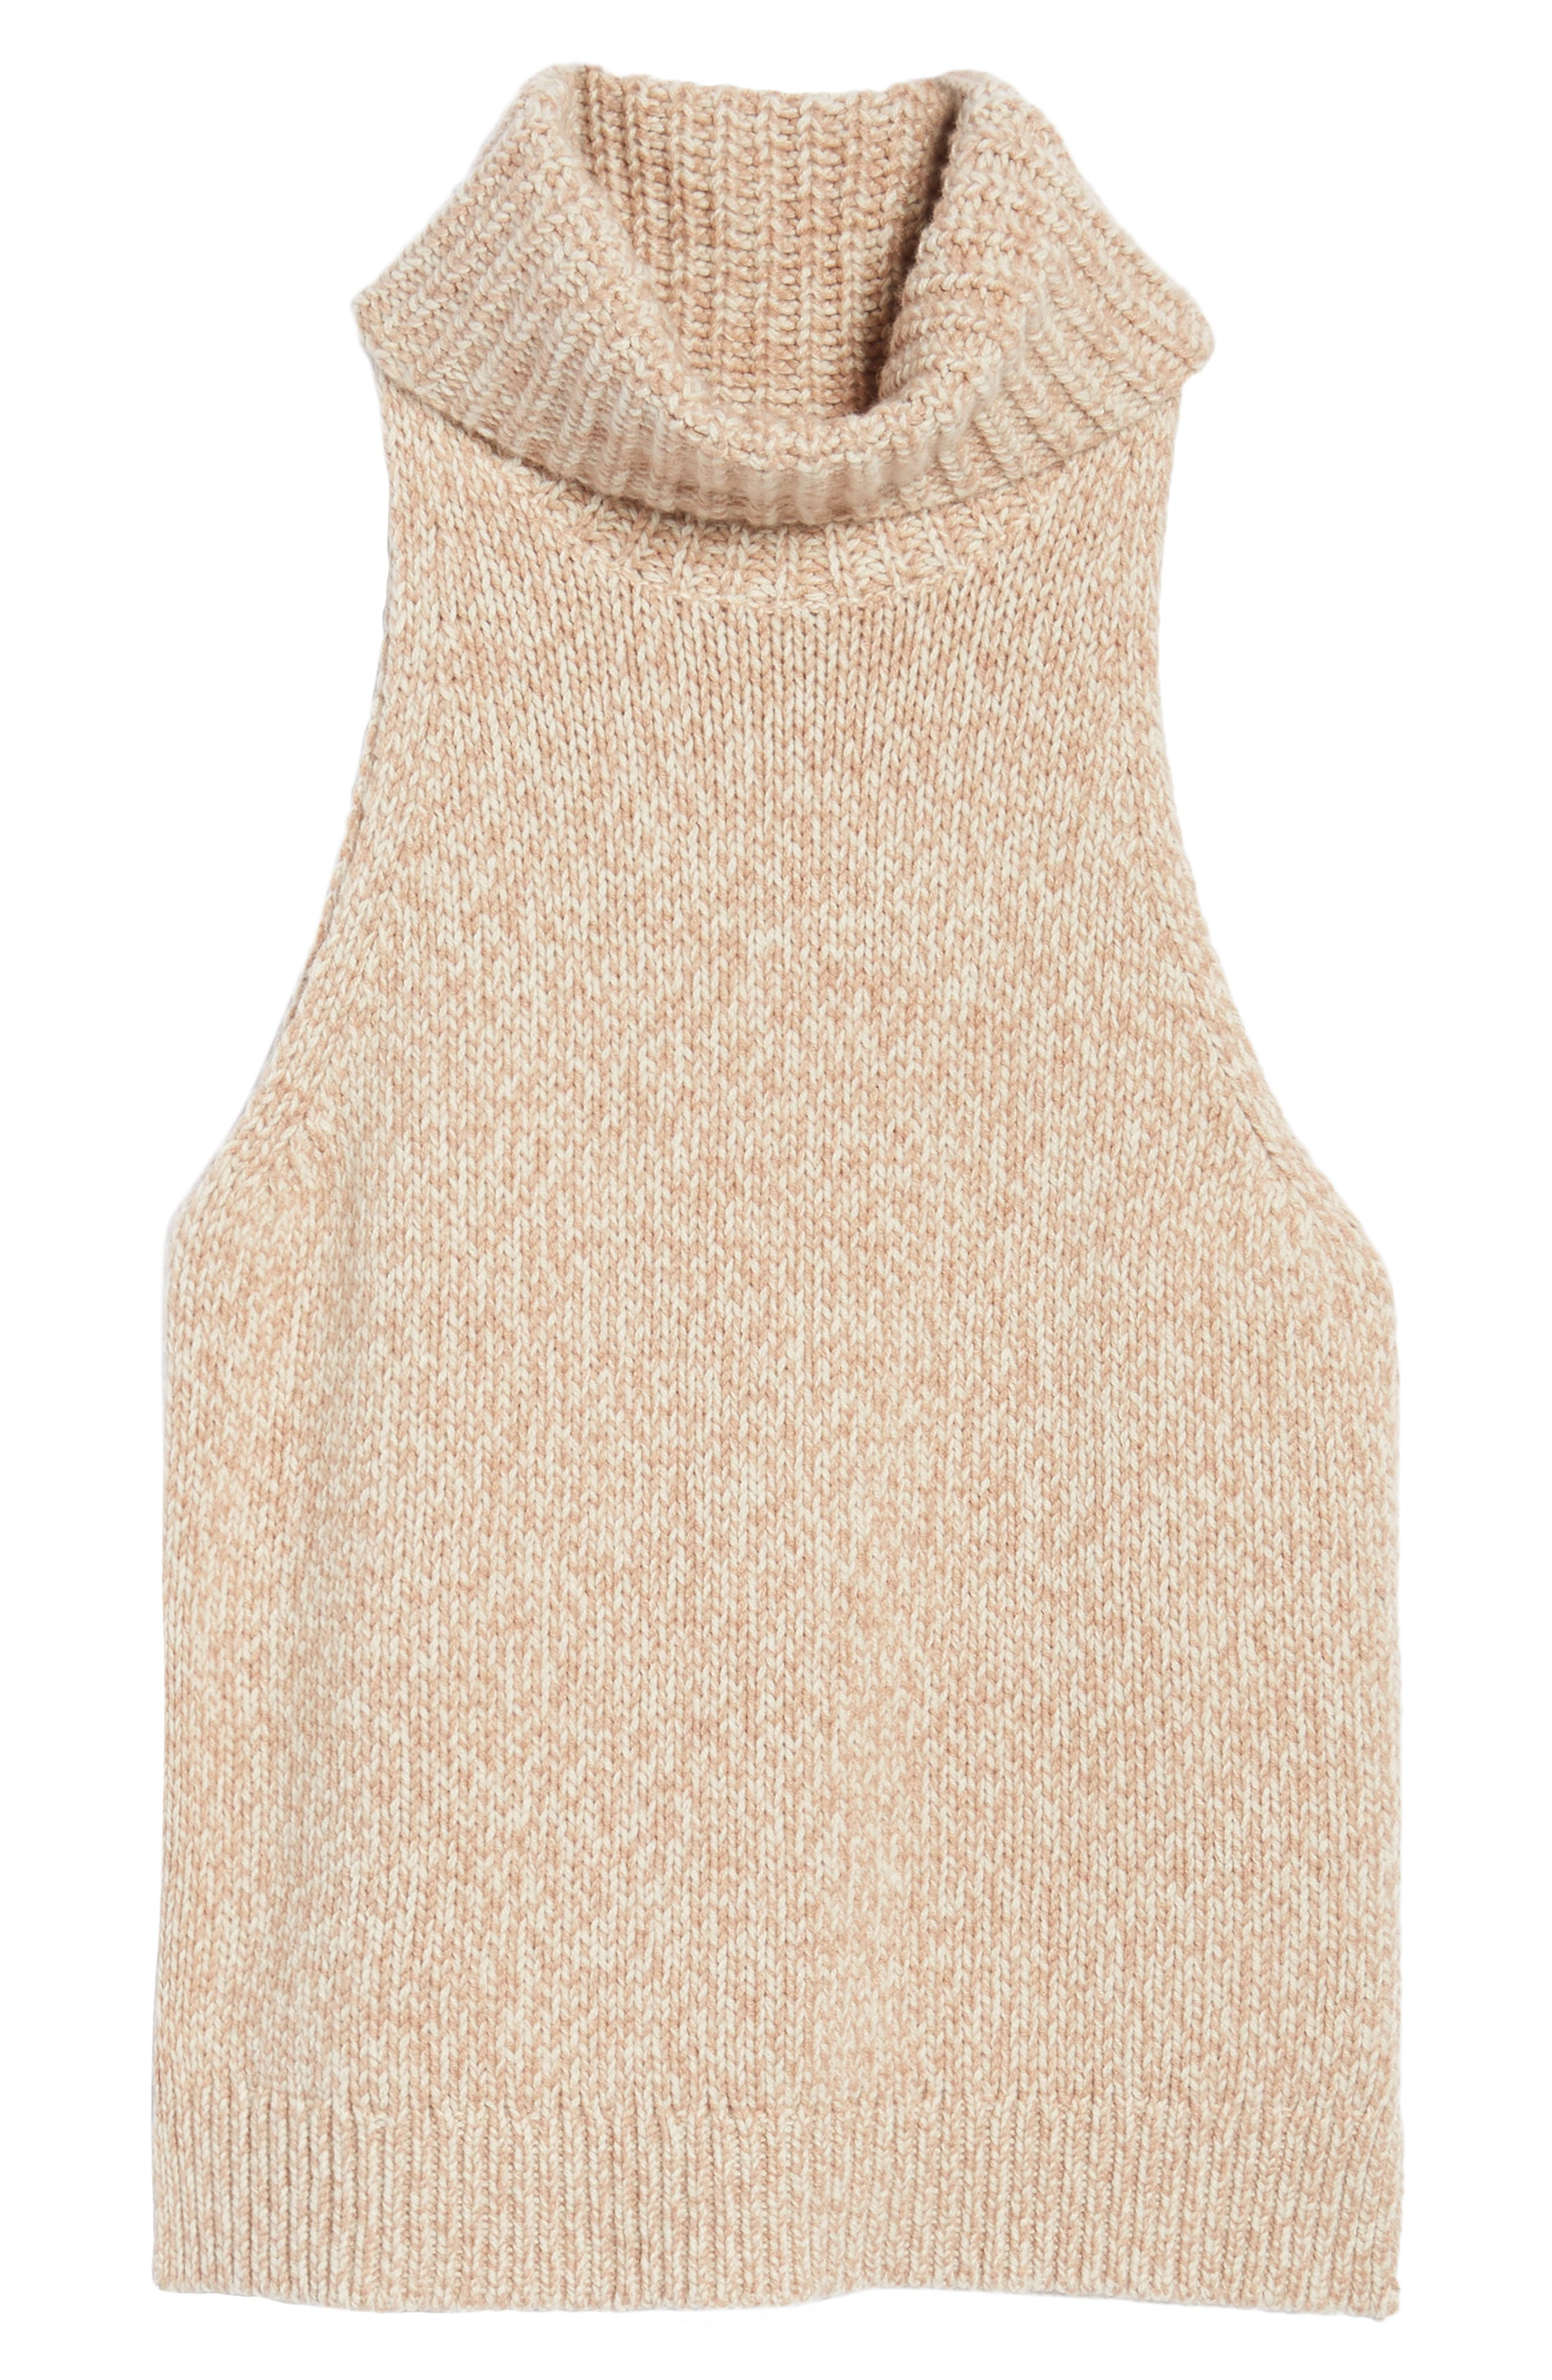 Marled Sleeveless Turtleneck Sweater,                             Main thumbnail 1, color,                             Marled Voile